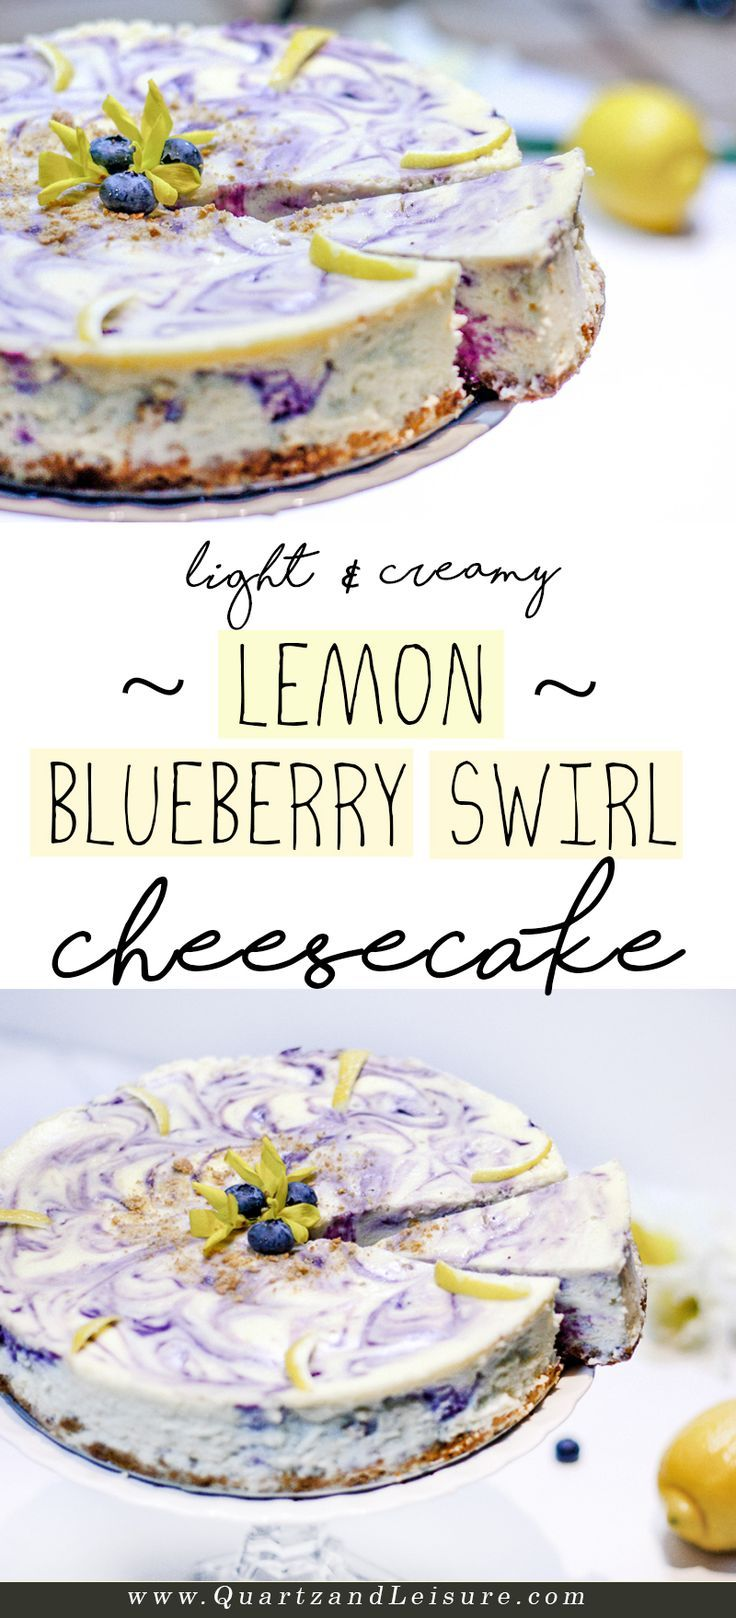 Lemon Blueberry Swirl Cheesecake - Quartz & Leisure